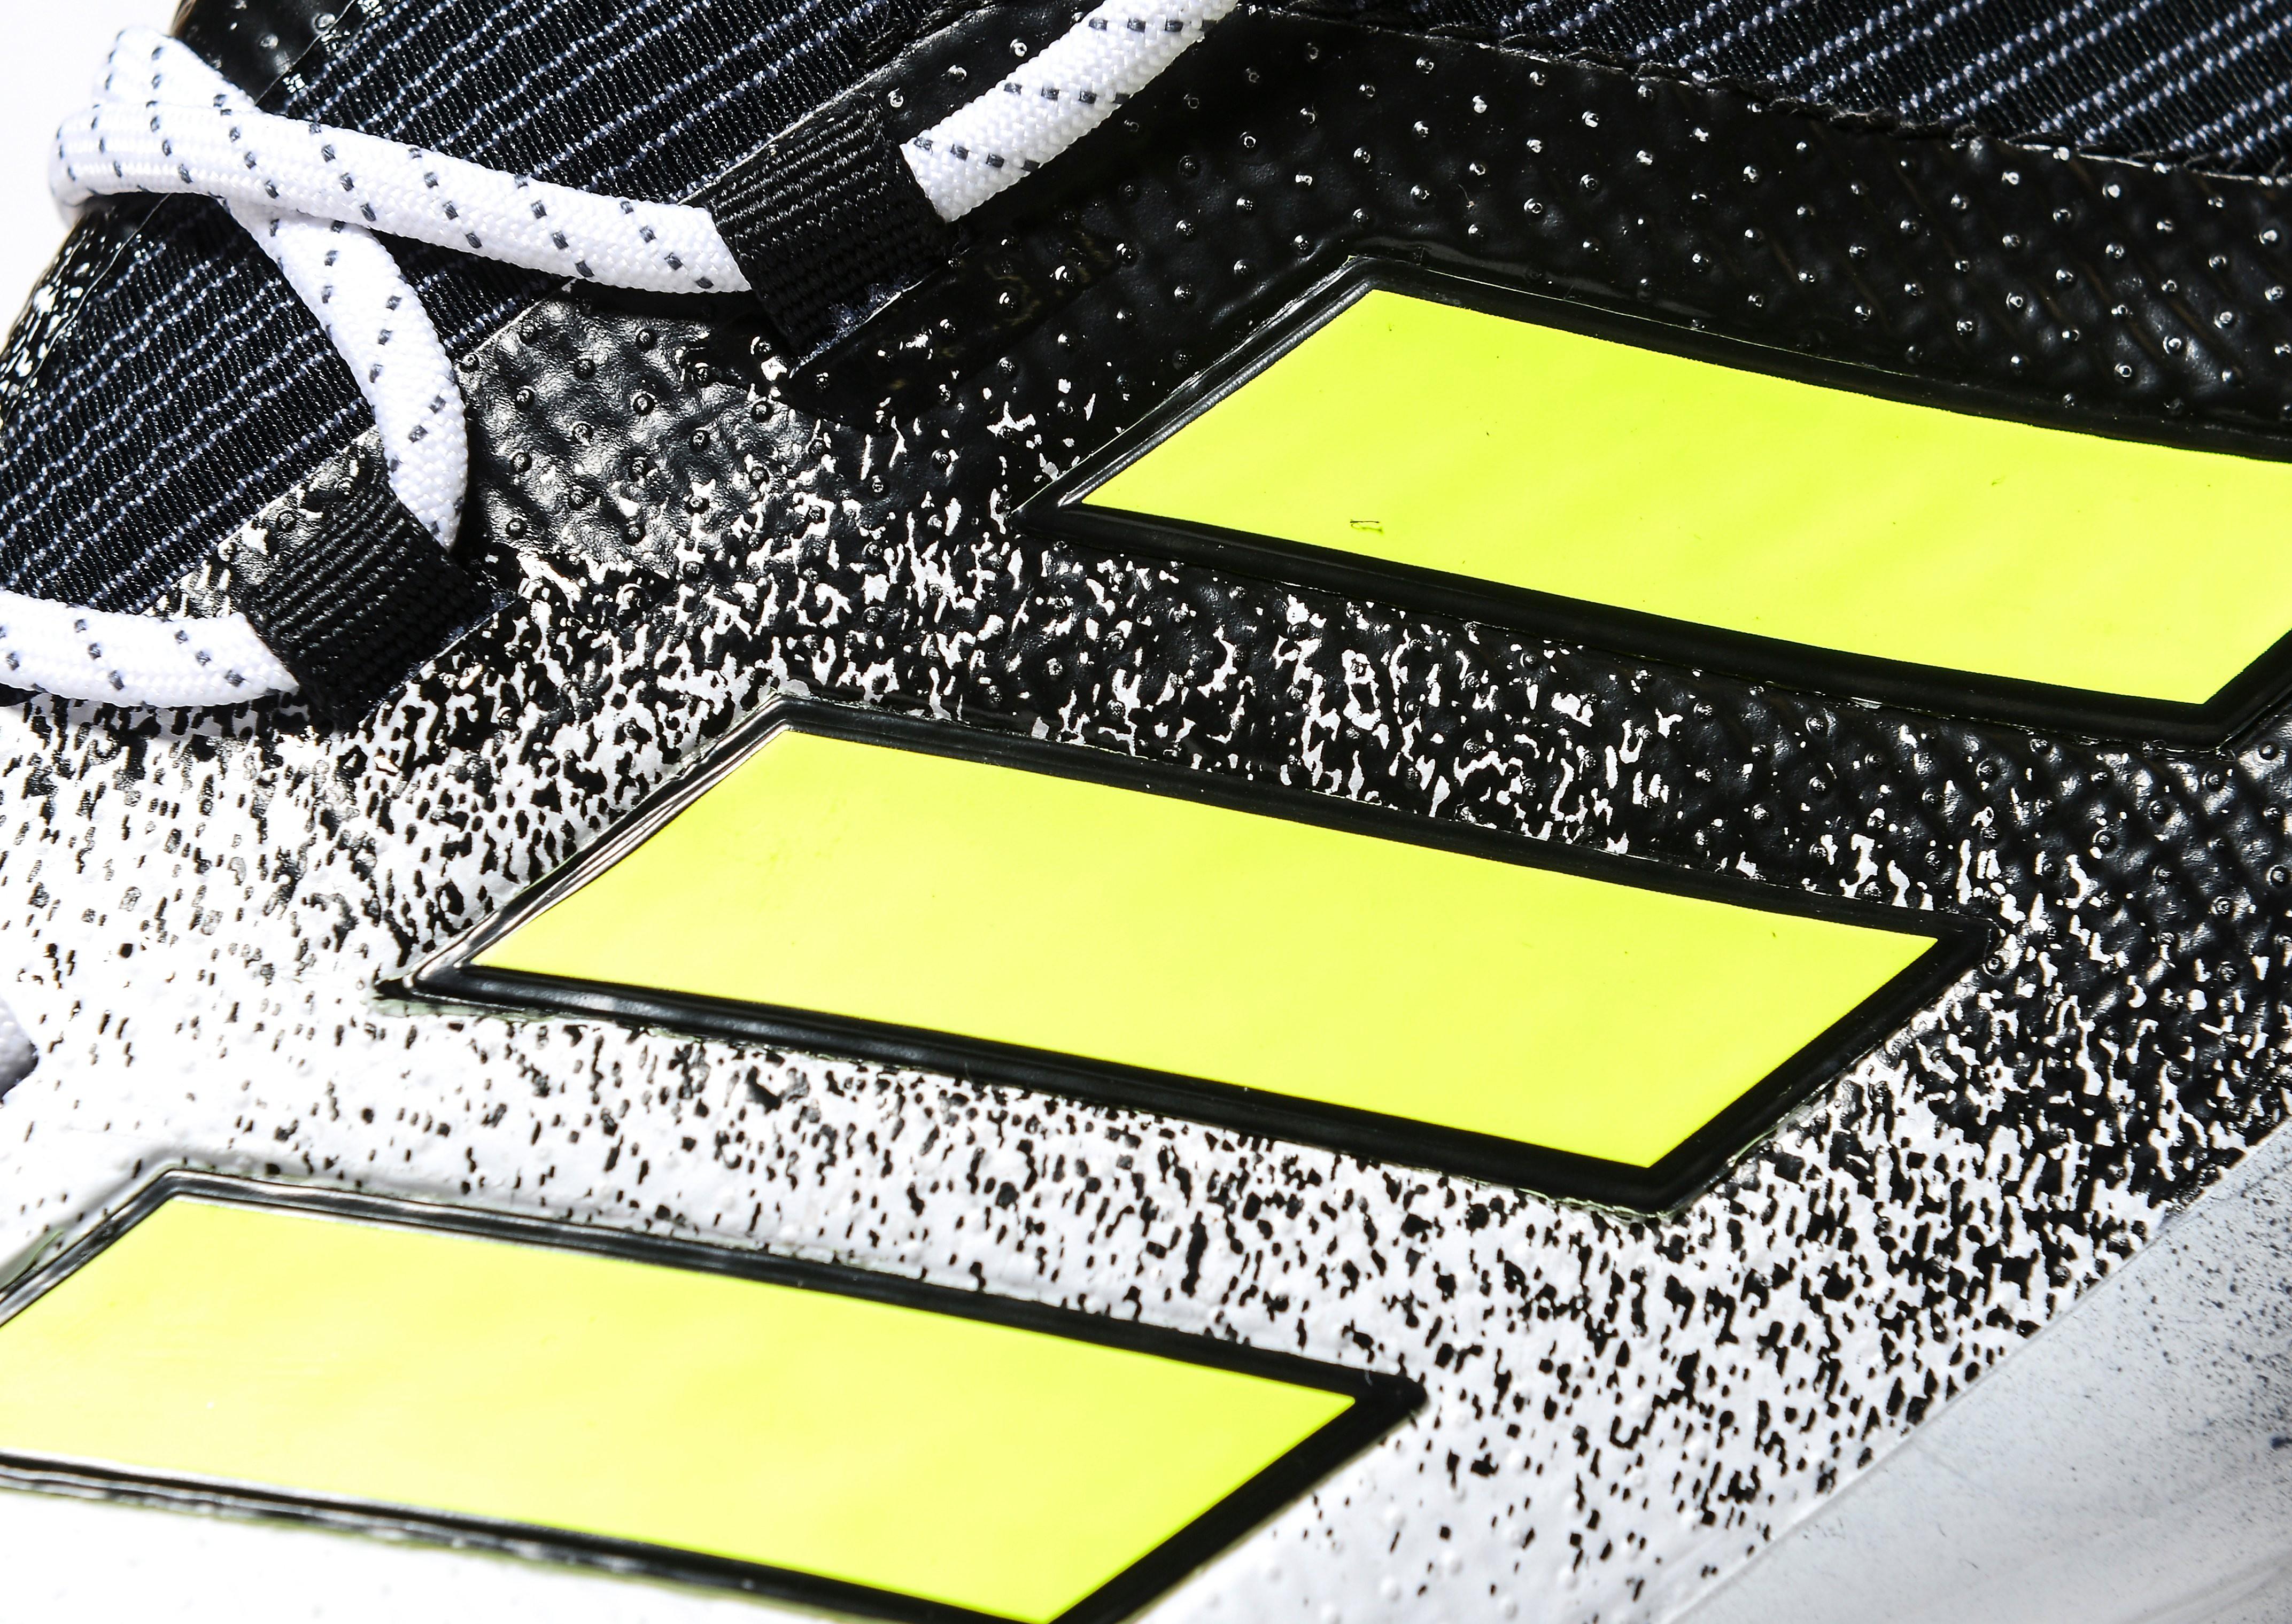 adidas Dust Storm ACE 17.1 Primeknit FG